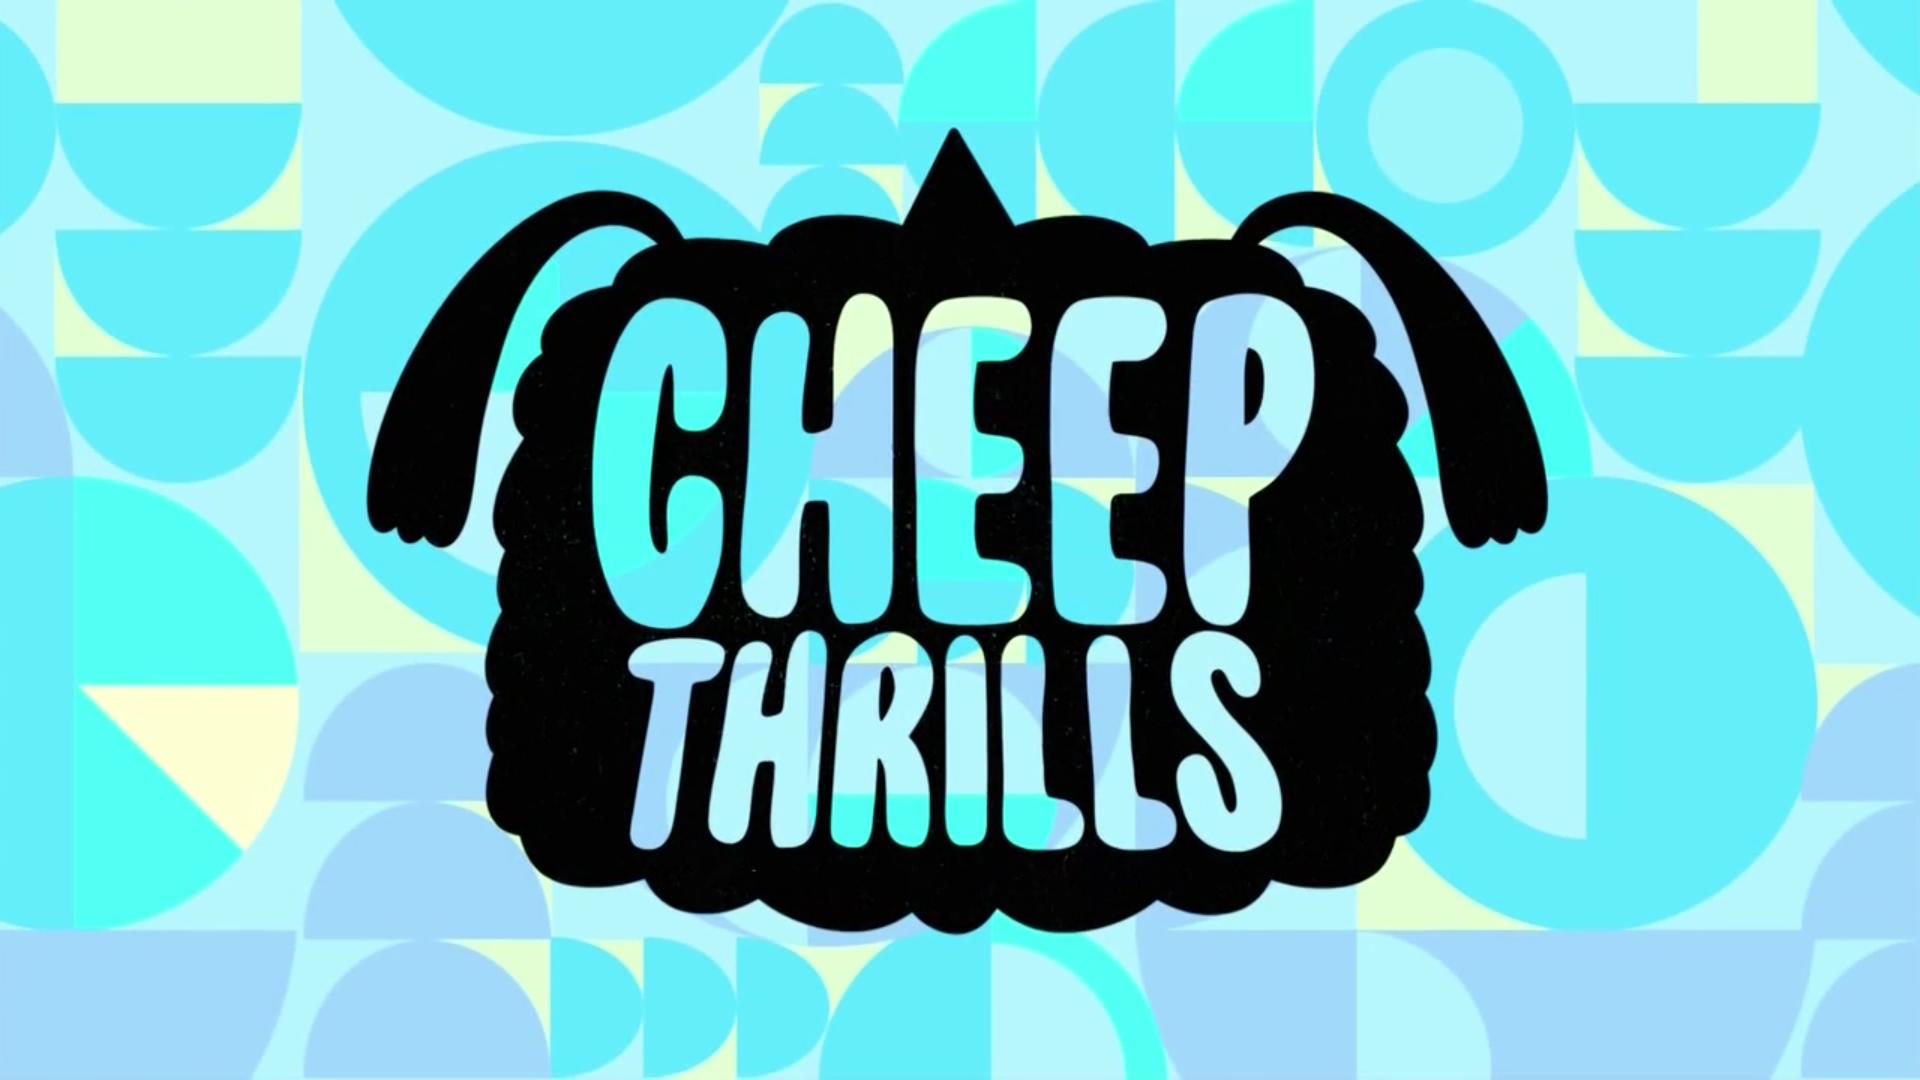 cheep thrills powerpuff girls wiki fandom powered by wikia